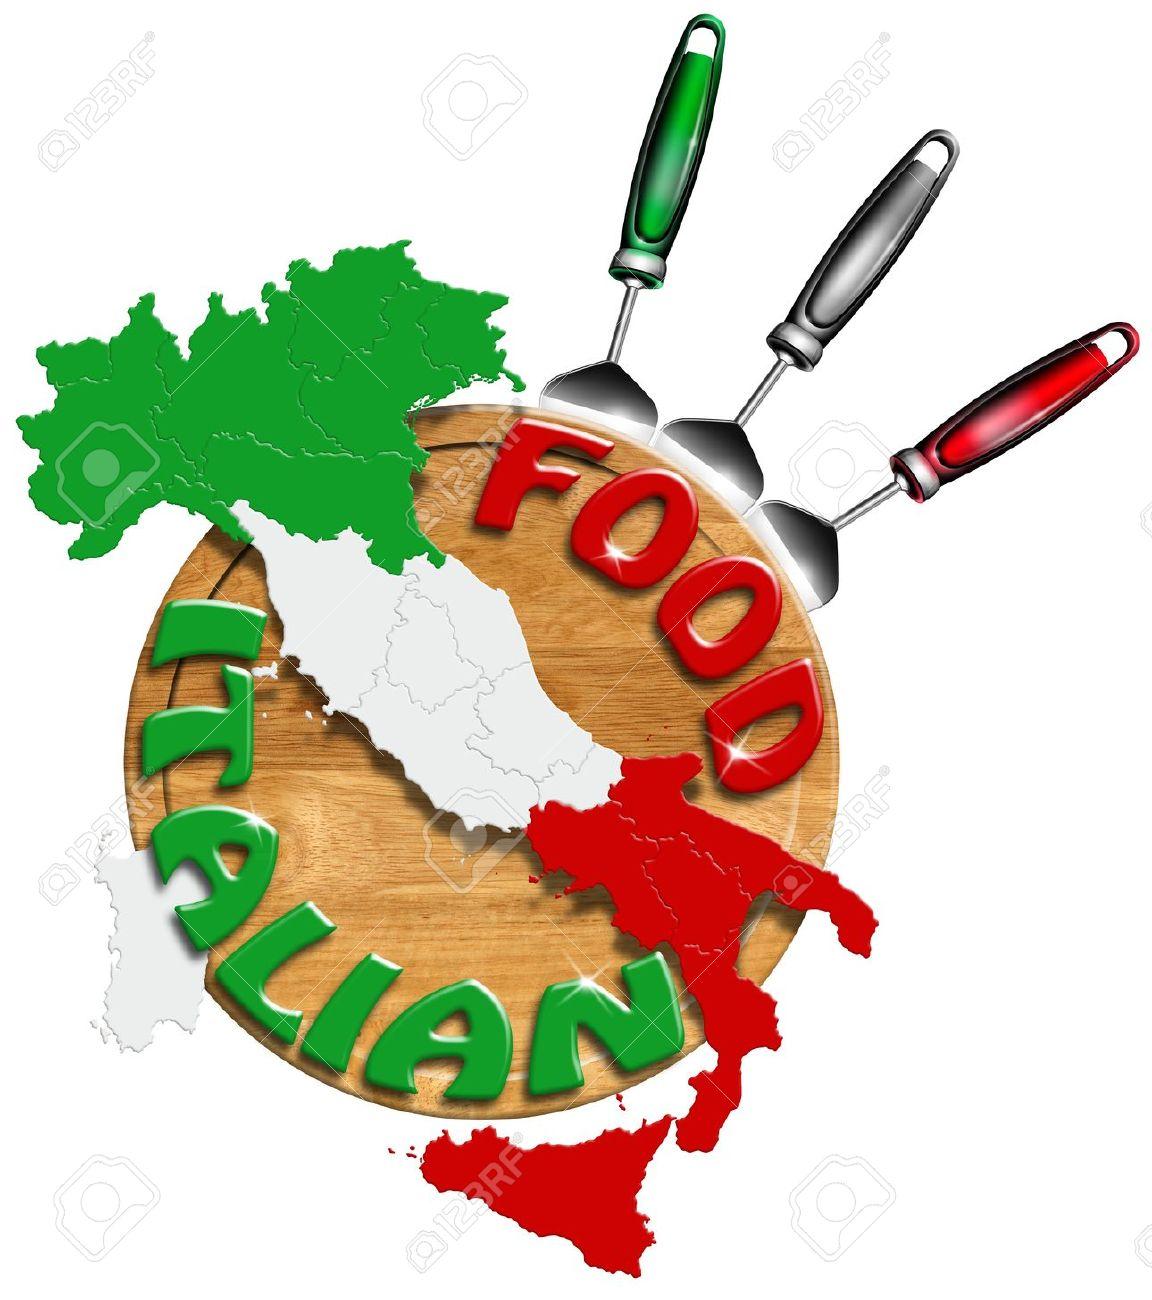 1152x1300 Restaurant Clipart Italian Restaurant